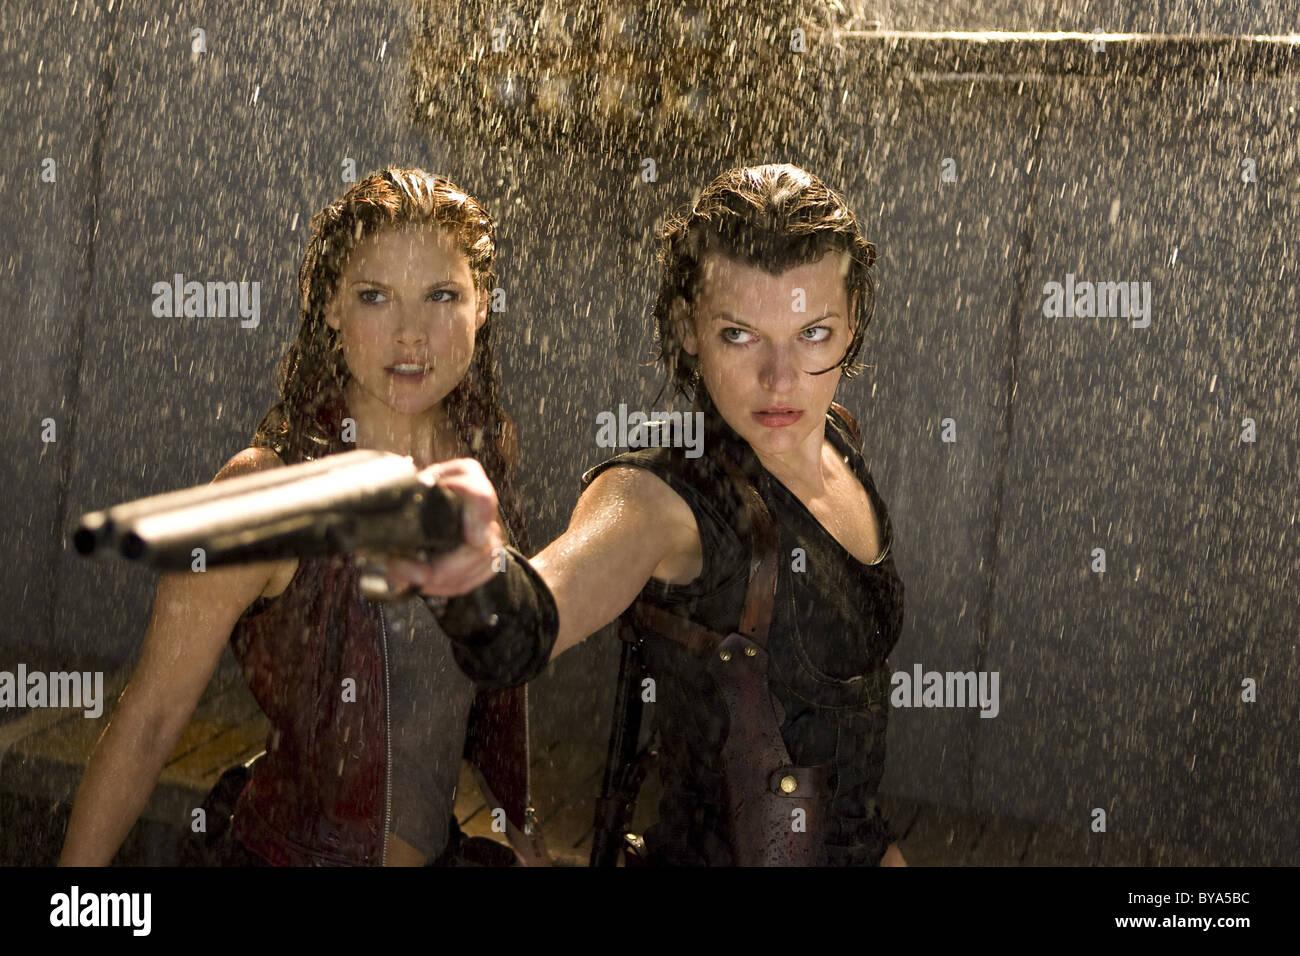 Resident Evil: Afterlife Año : 2010 USA / Director Británico : Paul W.S. Anderson Ali Larter, Milla Jovovich Imagen De Stock